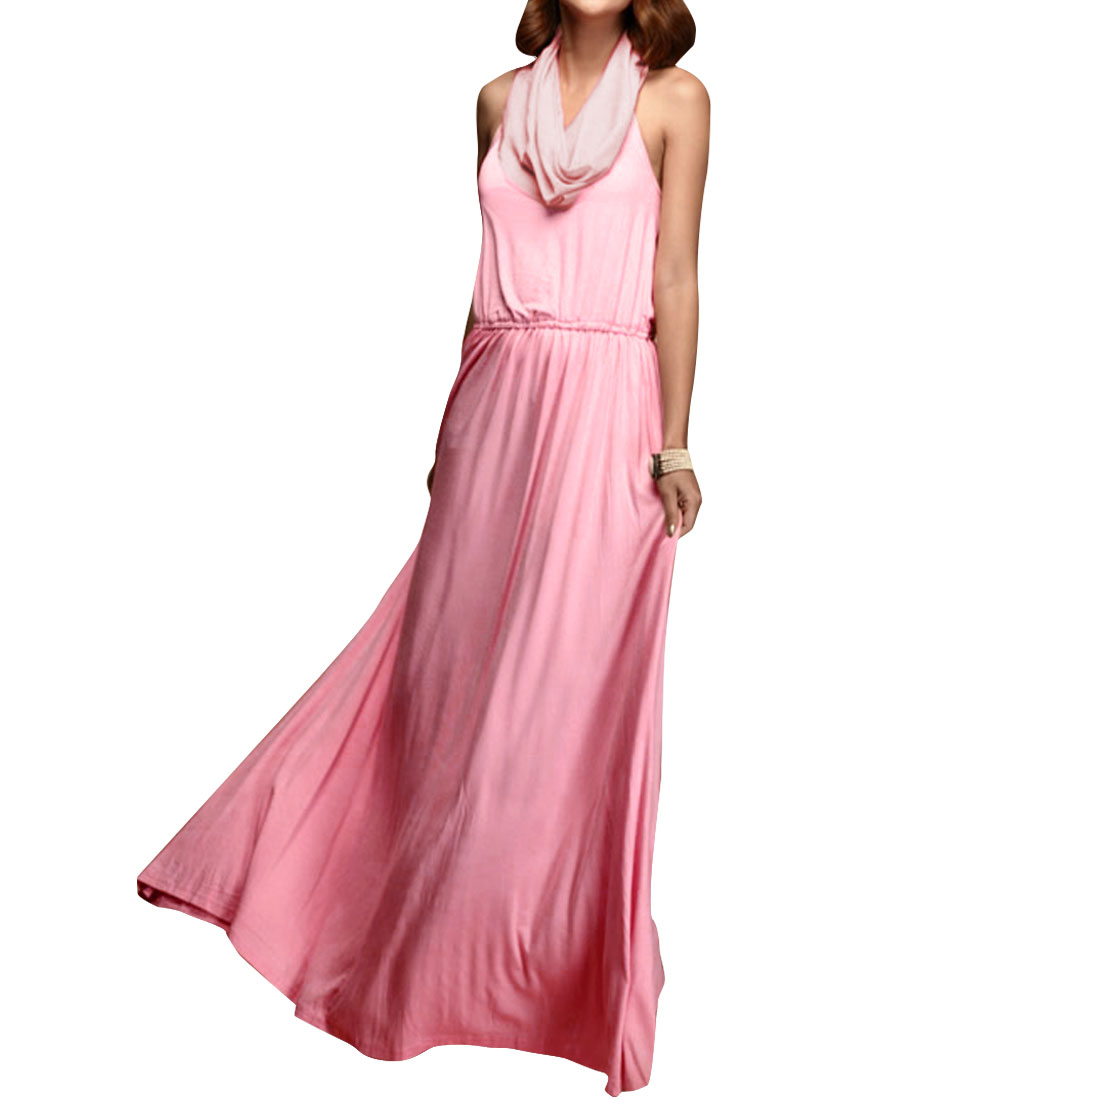 Ladies Cowl Neck Sleeveless Elastic Waist Maxi Dress Pink XS